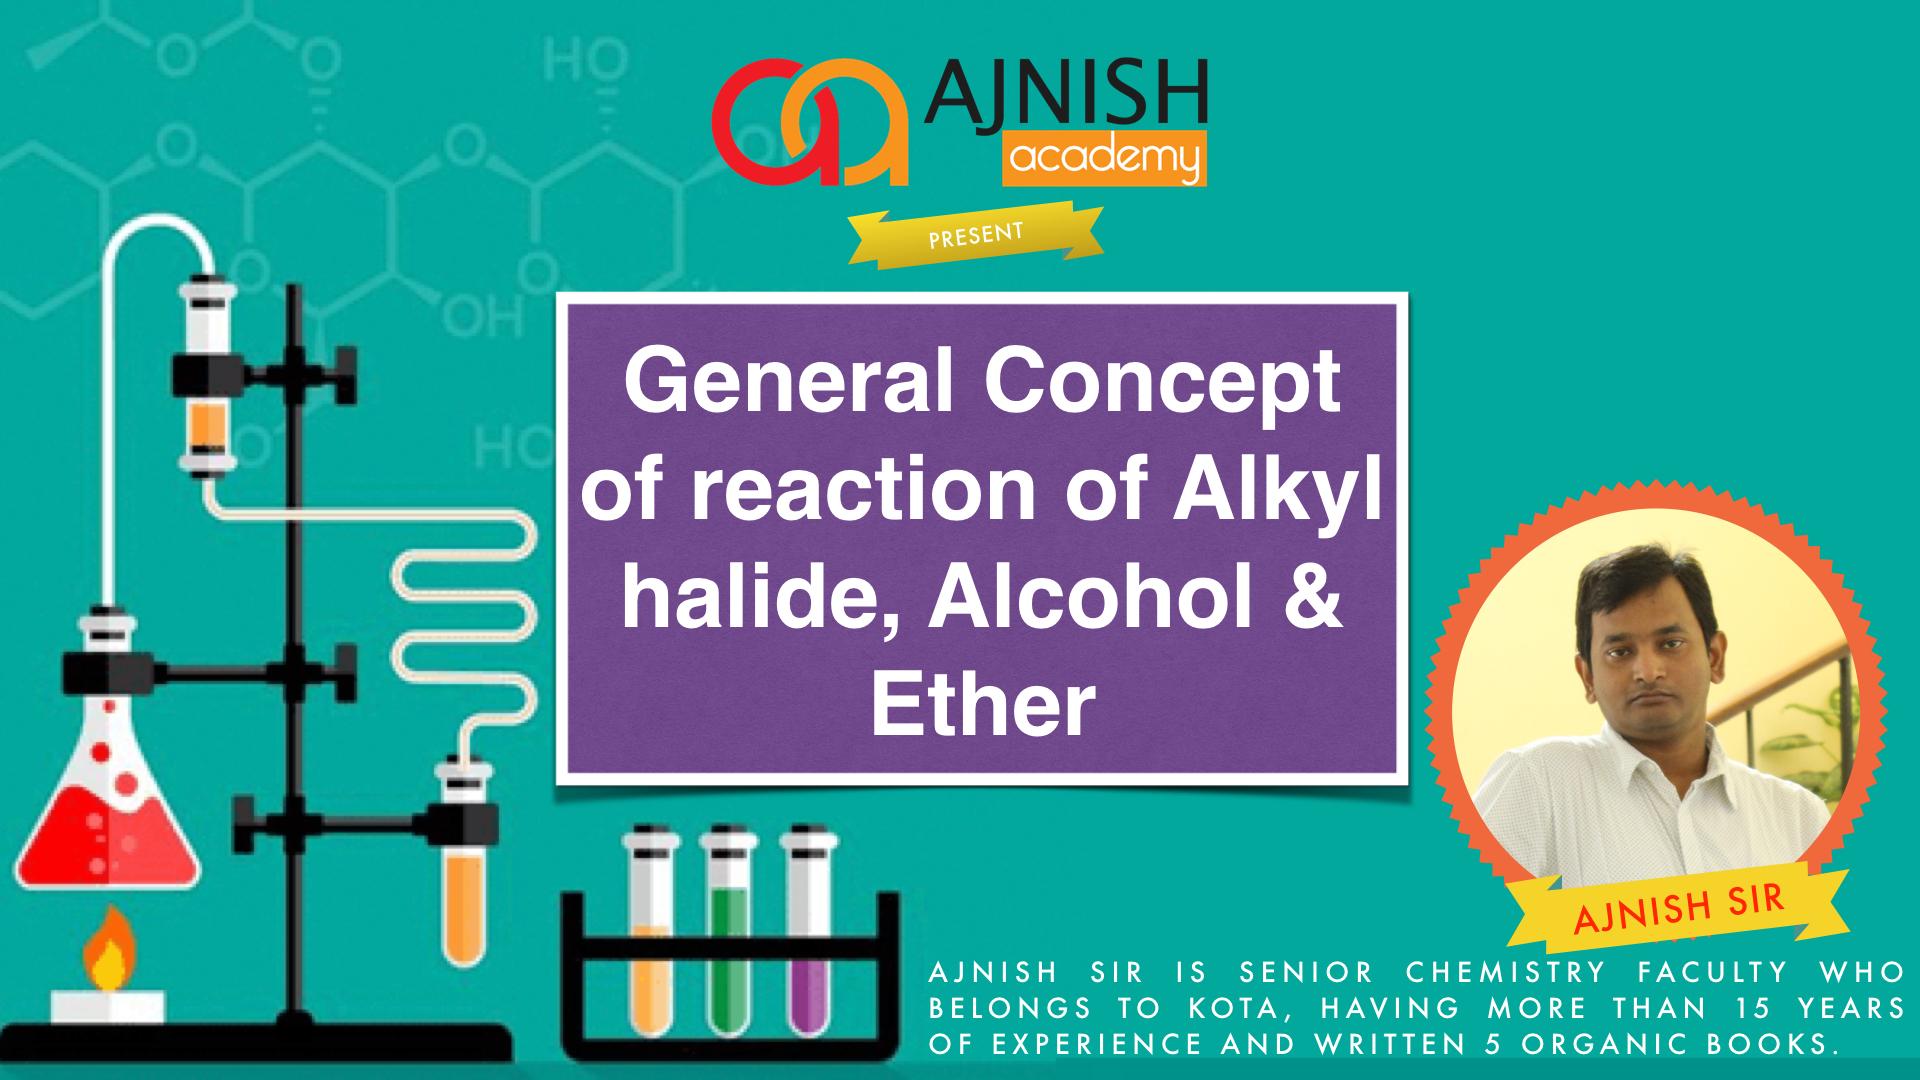 Alkyl halide